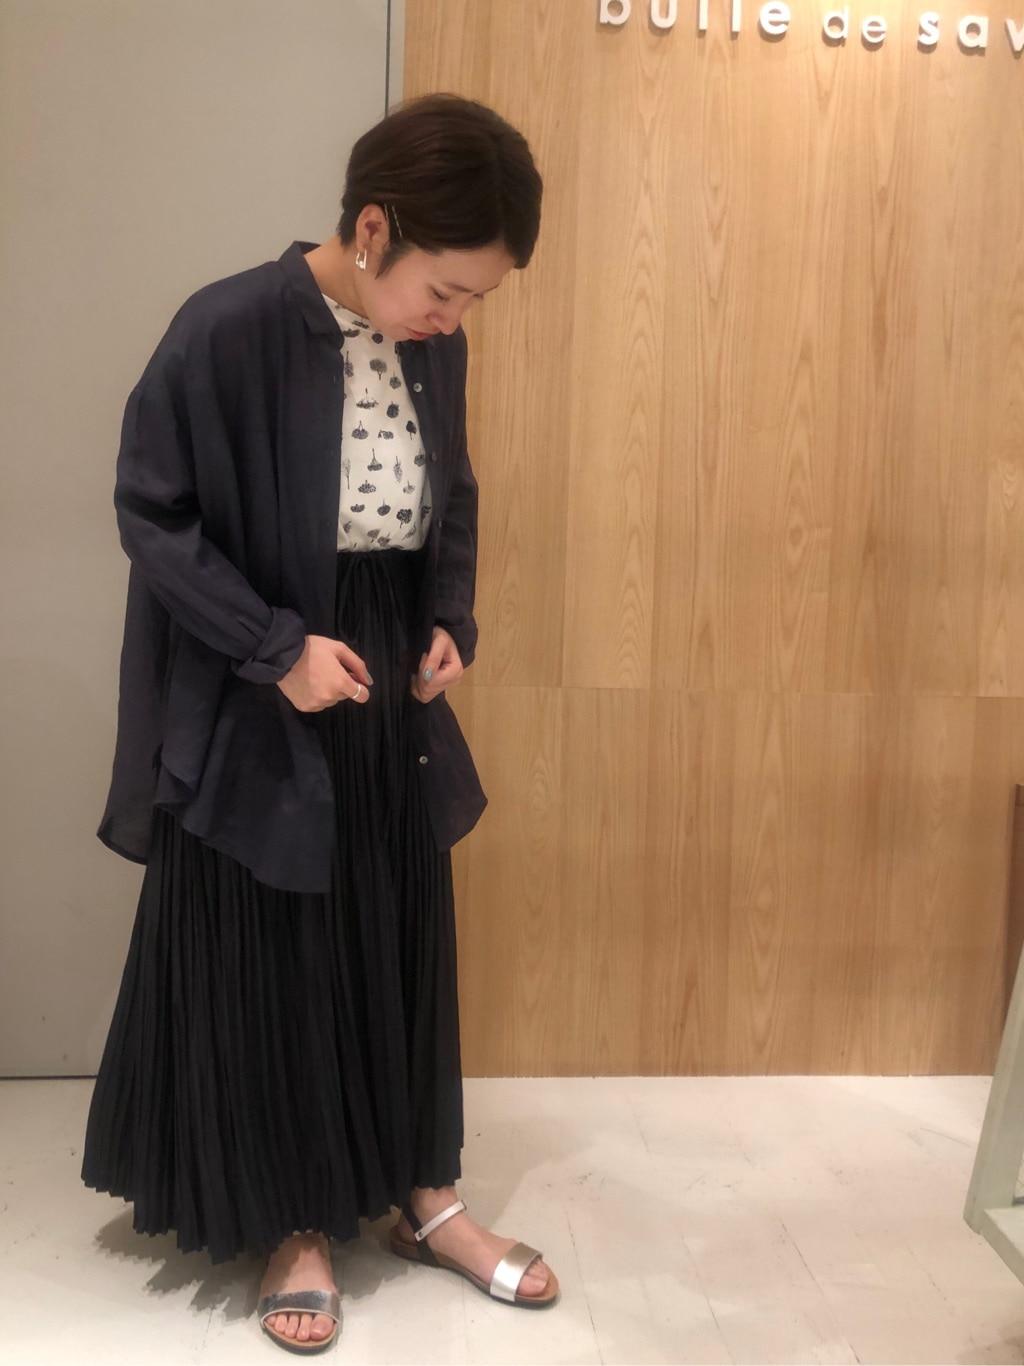 bulle de savon なんばシティ 身長:148cm 2020.07.10